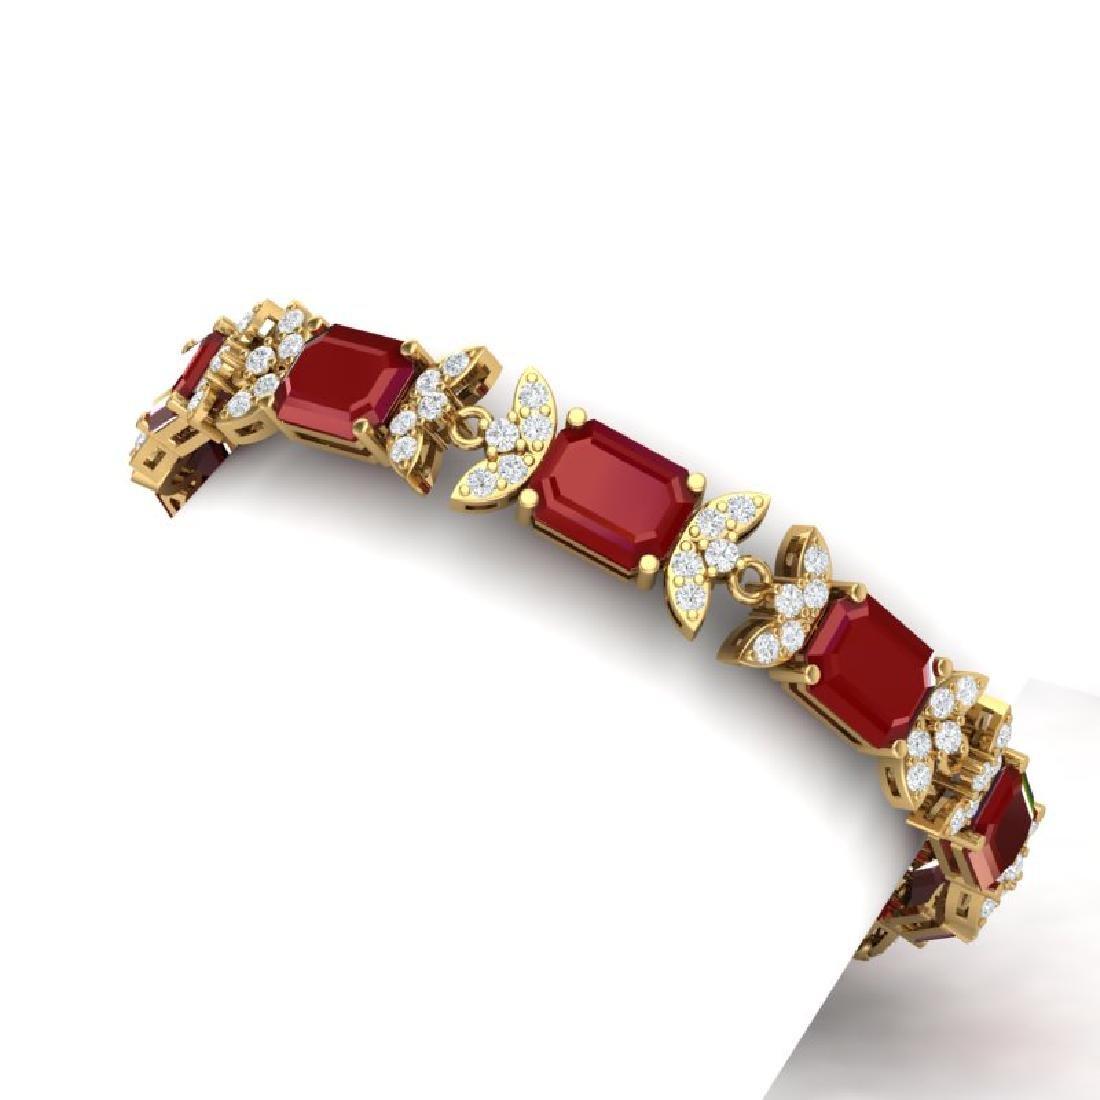 38.13 CTW Royalty Ruby & VS Diamond Bracelet 18K Yellow